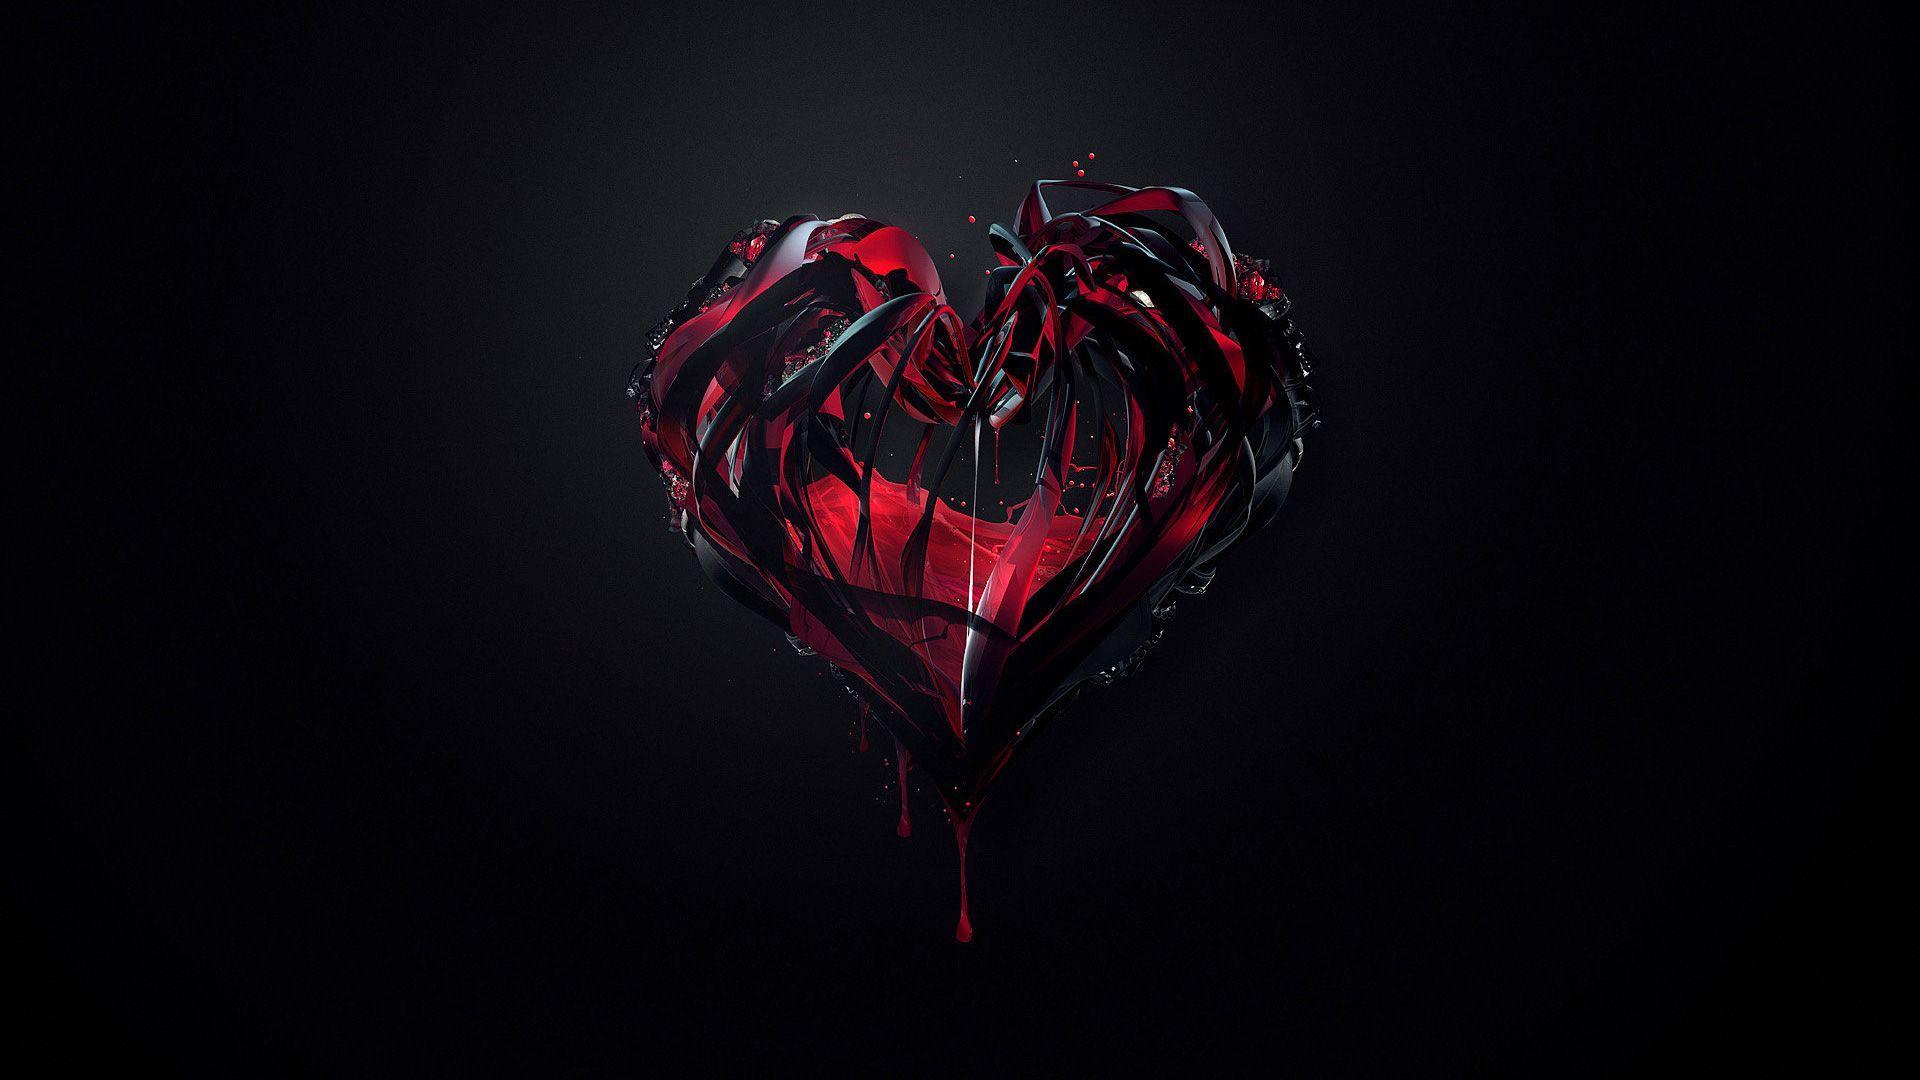 Full Size Black and red love hearts wallpaper hd, black wallpaper 4k